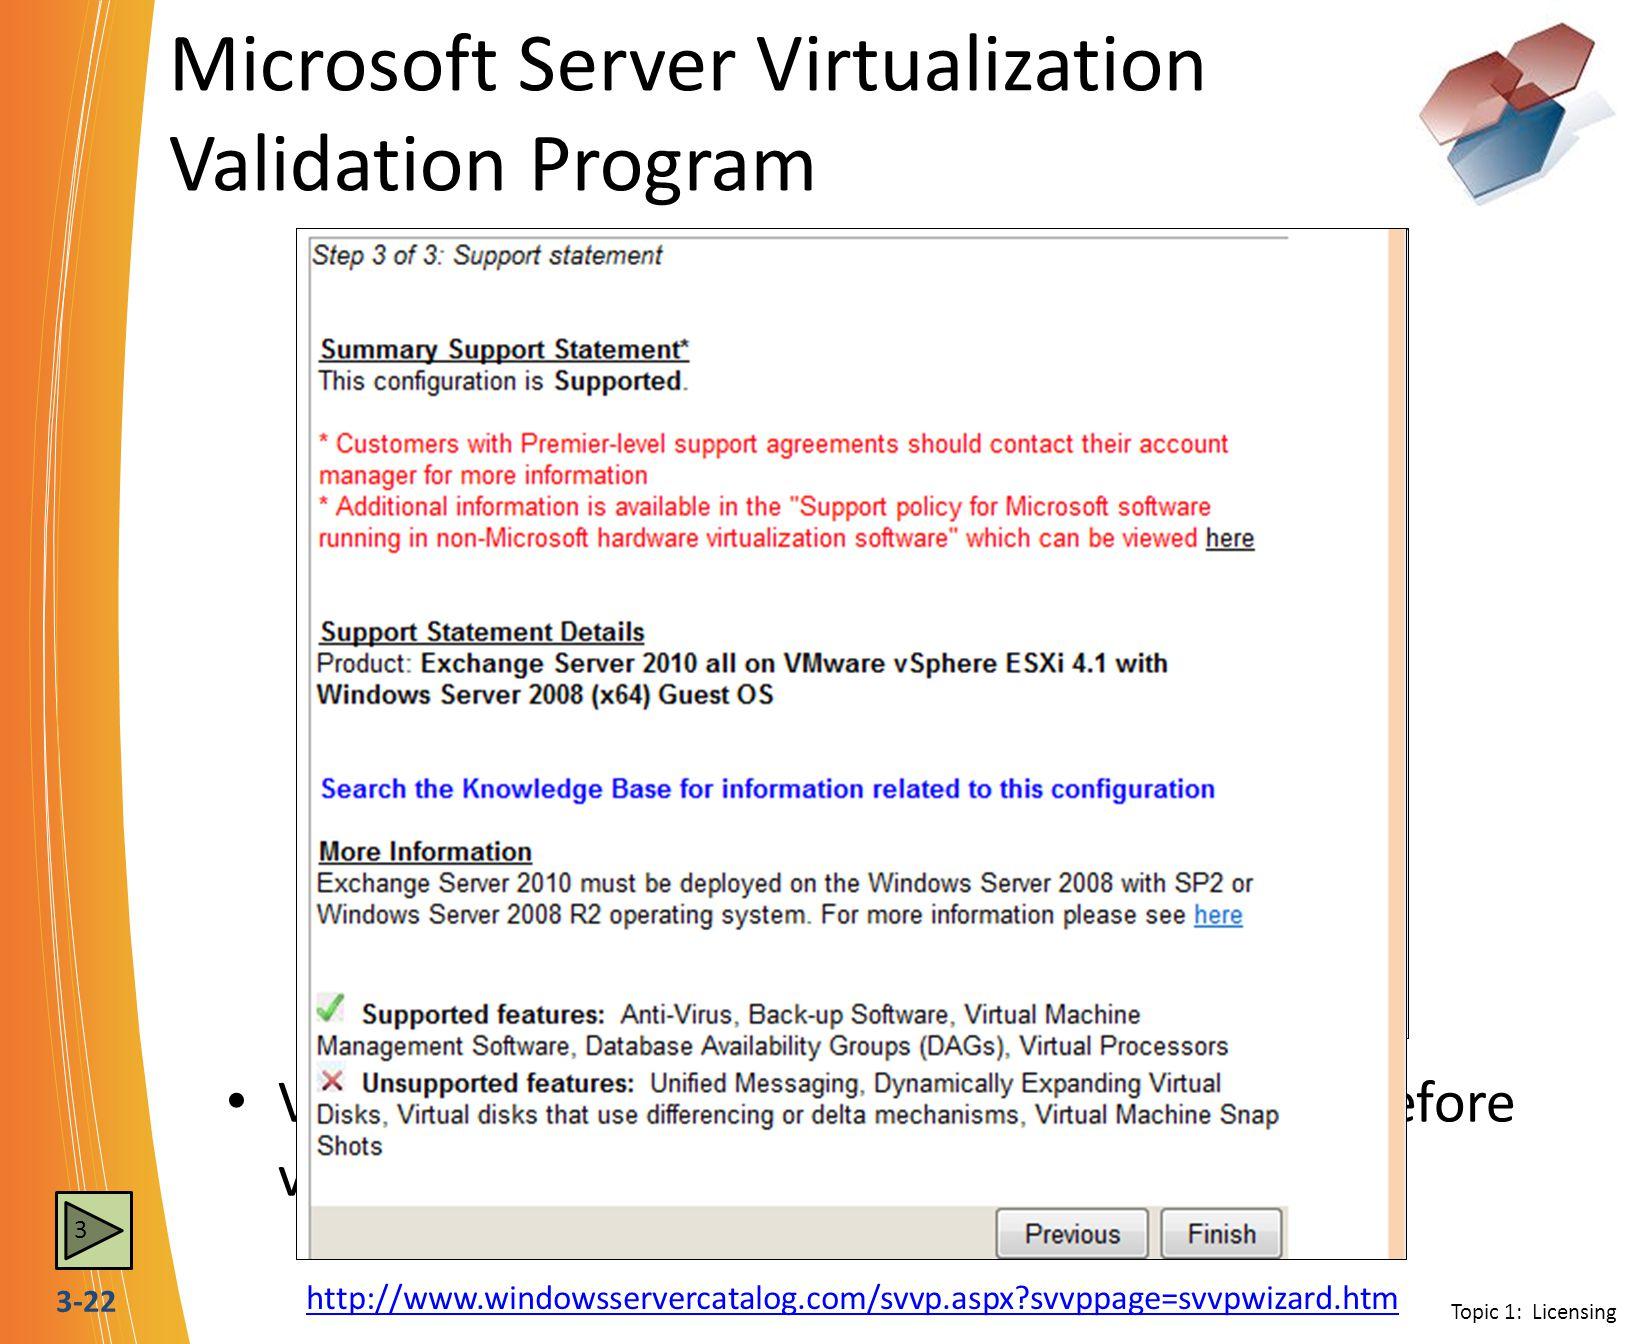 Microsoft Server Virtualization Validation Program